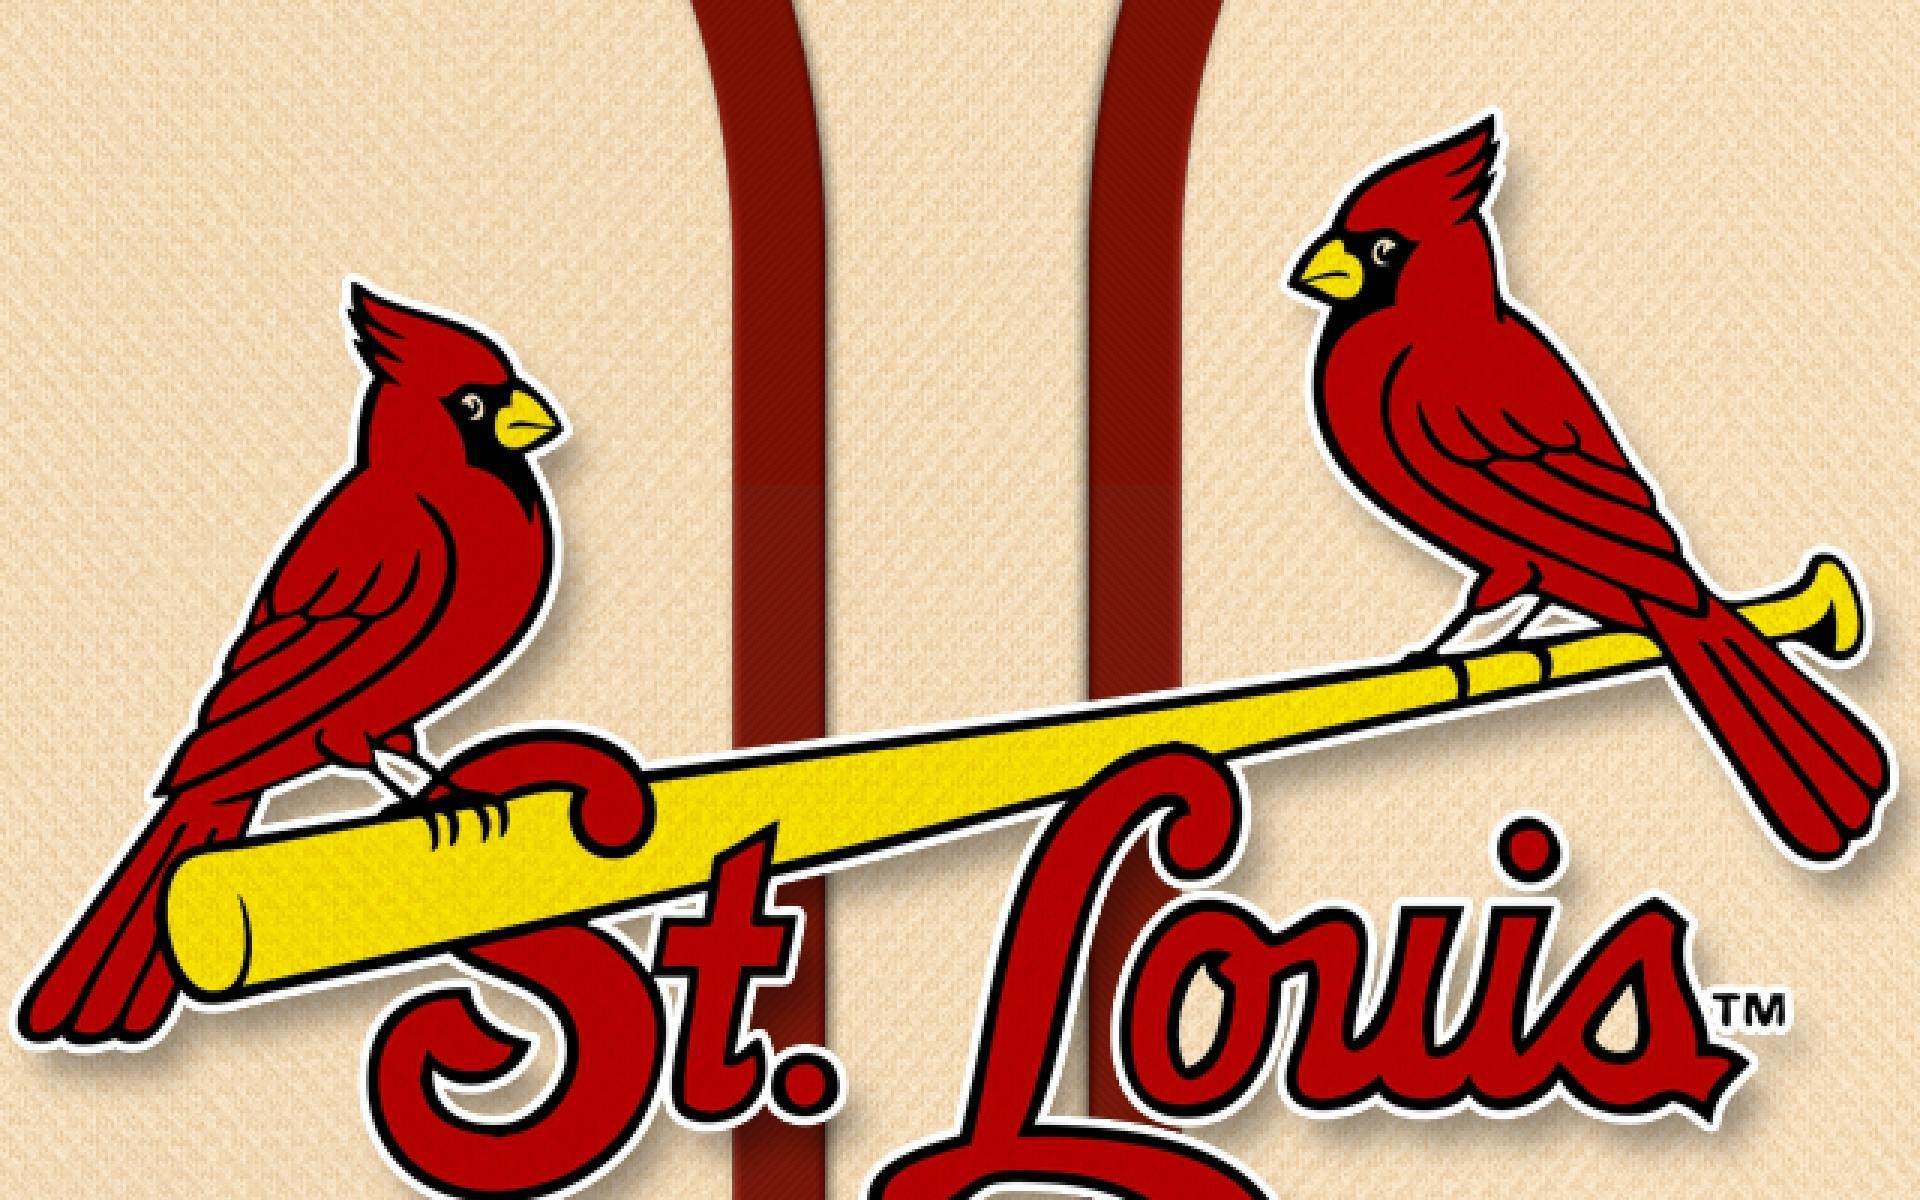 St Louis Cardinals Wallpaper HD (65+ Images